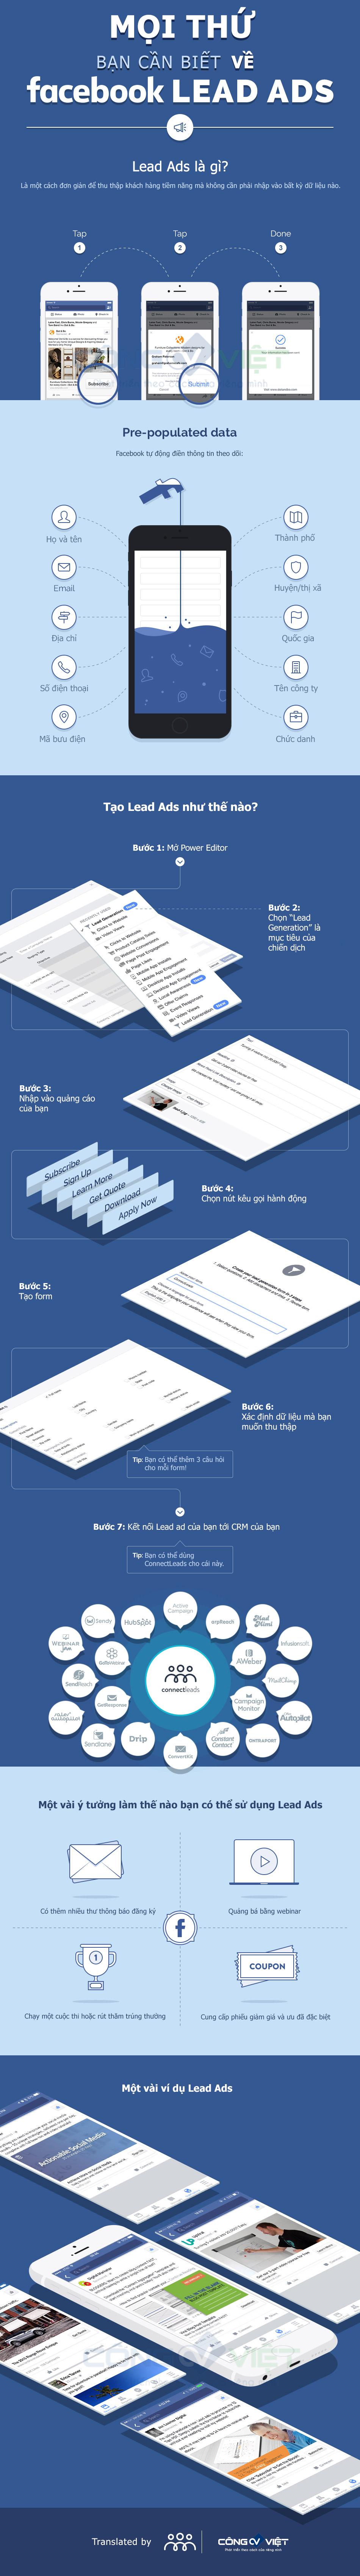 Mọi thứ bạn cần biết về facebook lead ads